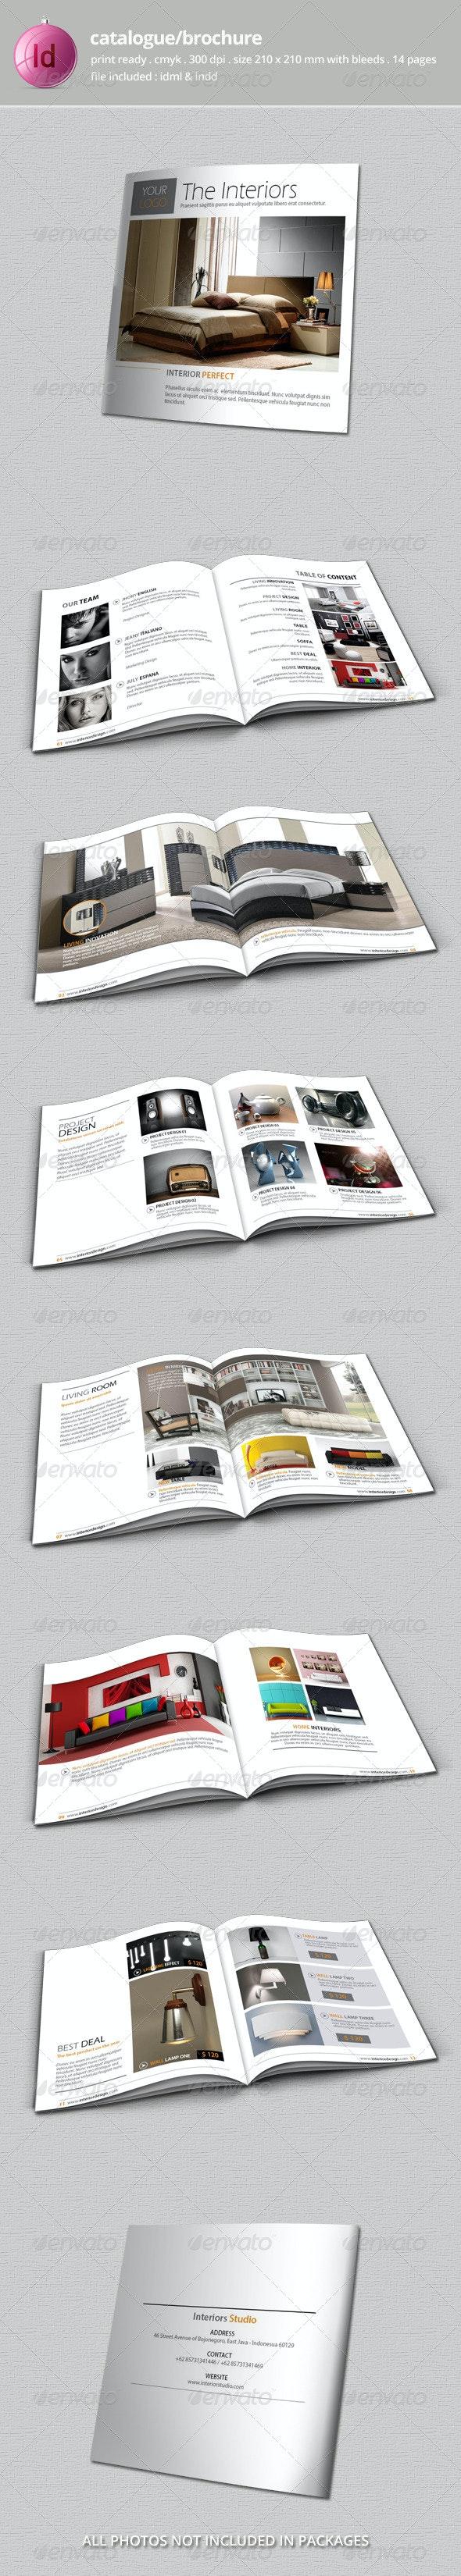 Catalogue / Bochure Template - Catalogs Brochures